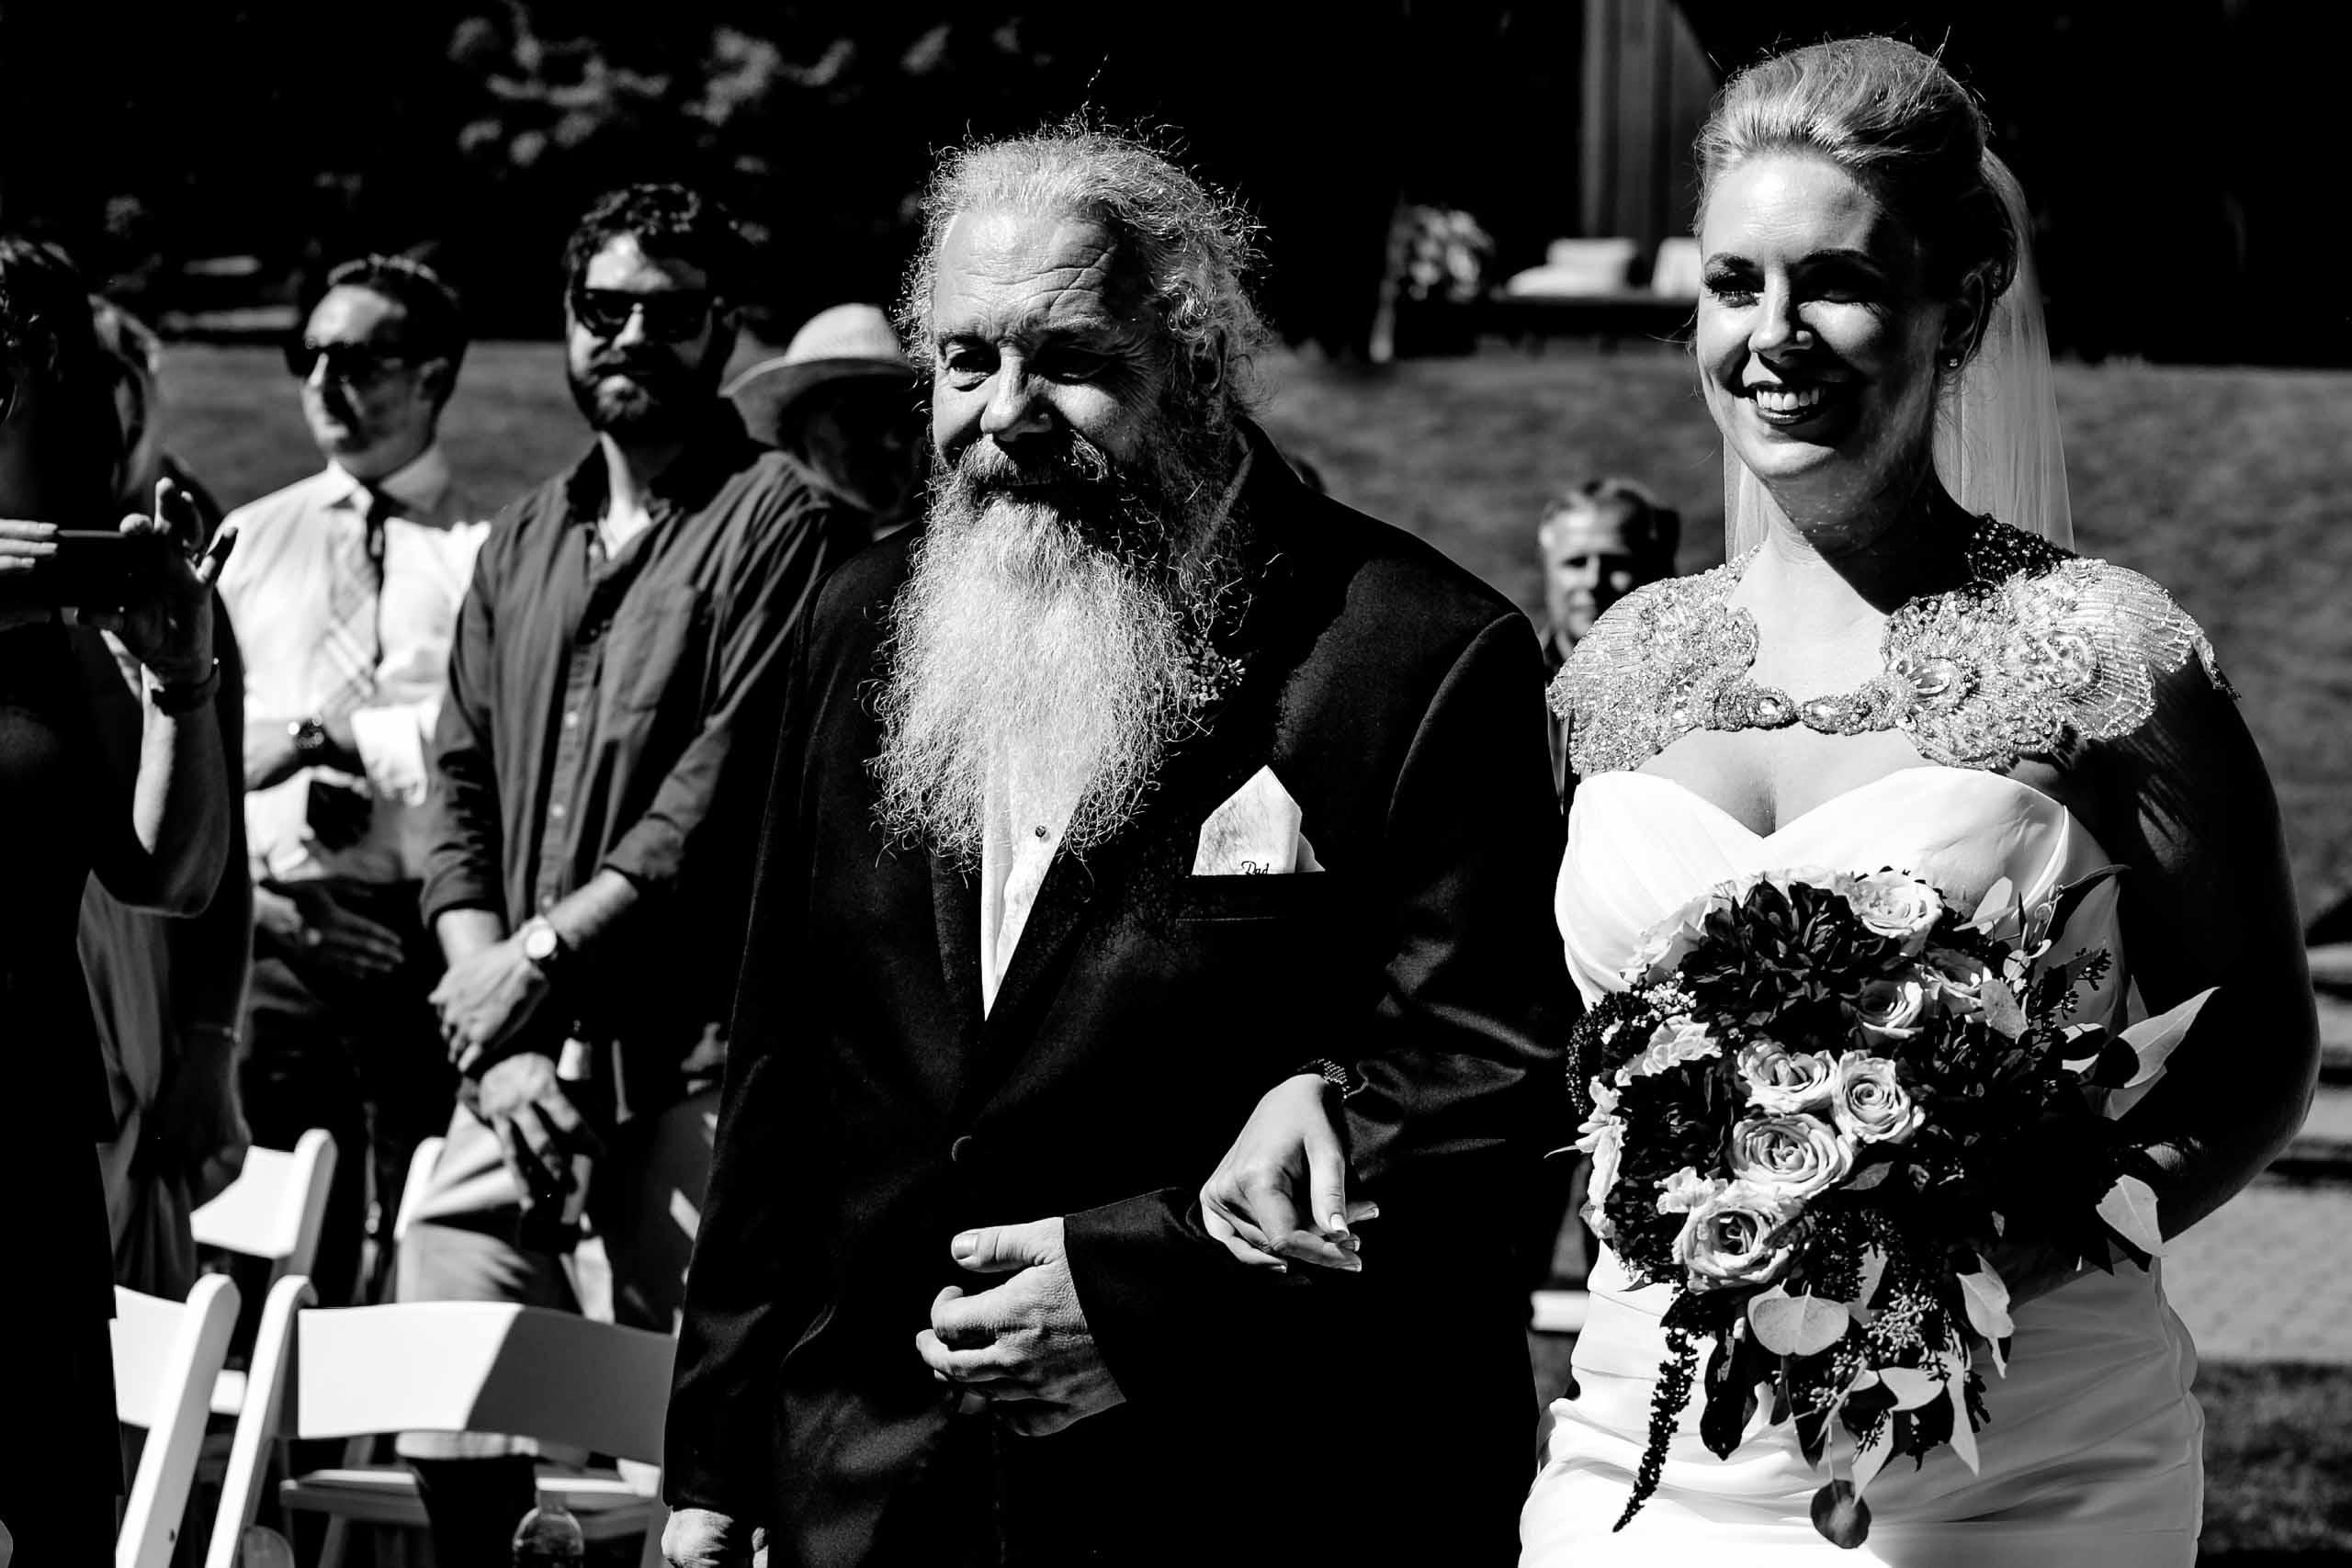 Father walking bride into ceremony at Gorge Crest wedding venue near Hood River just outside Portland, Oregon.